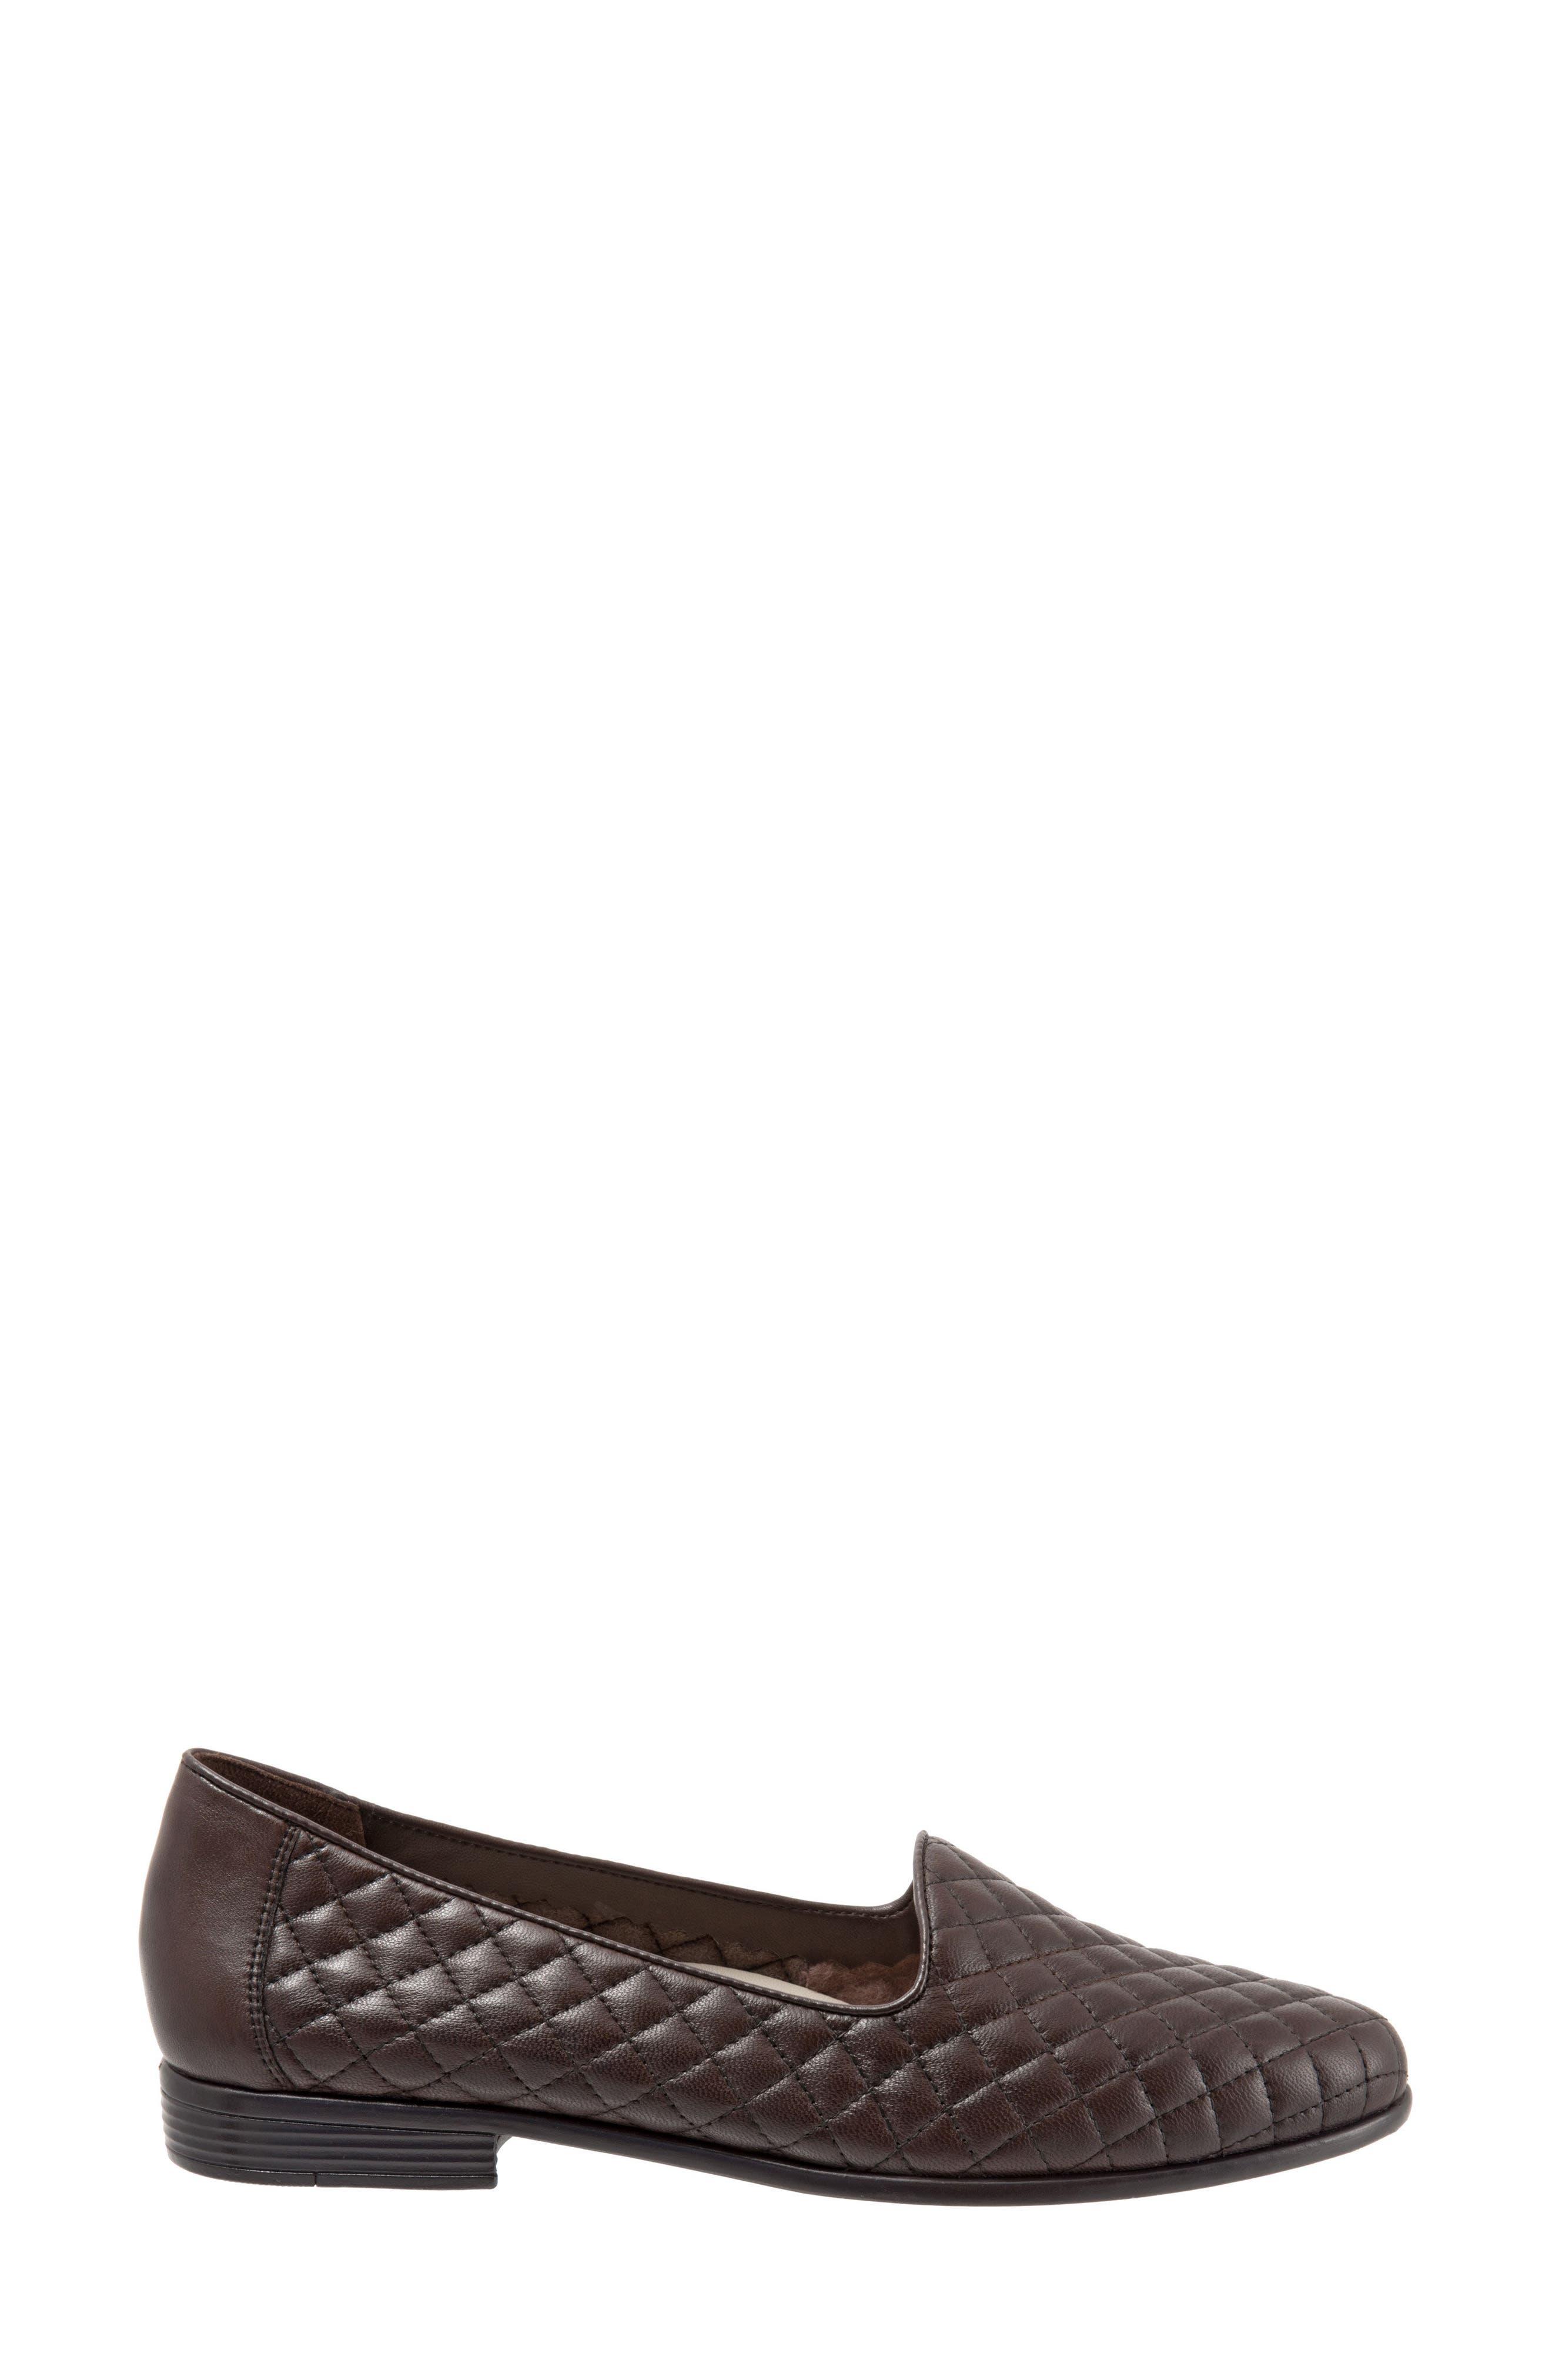 Liz Woven Loafer Flat,                             Alternate thumbnail 3, color,                             Dark Brown Leather